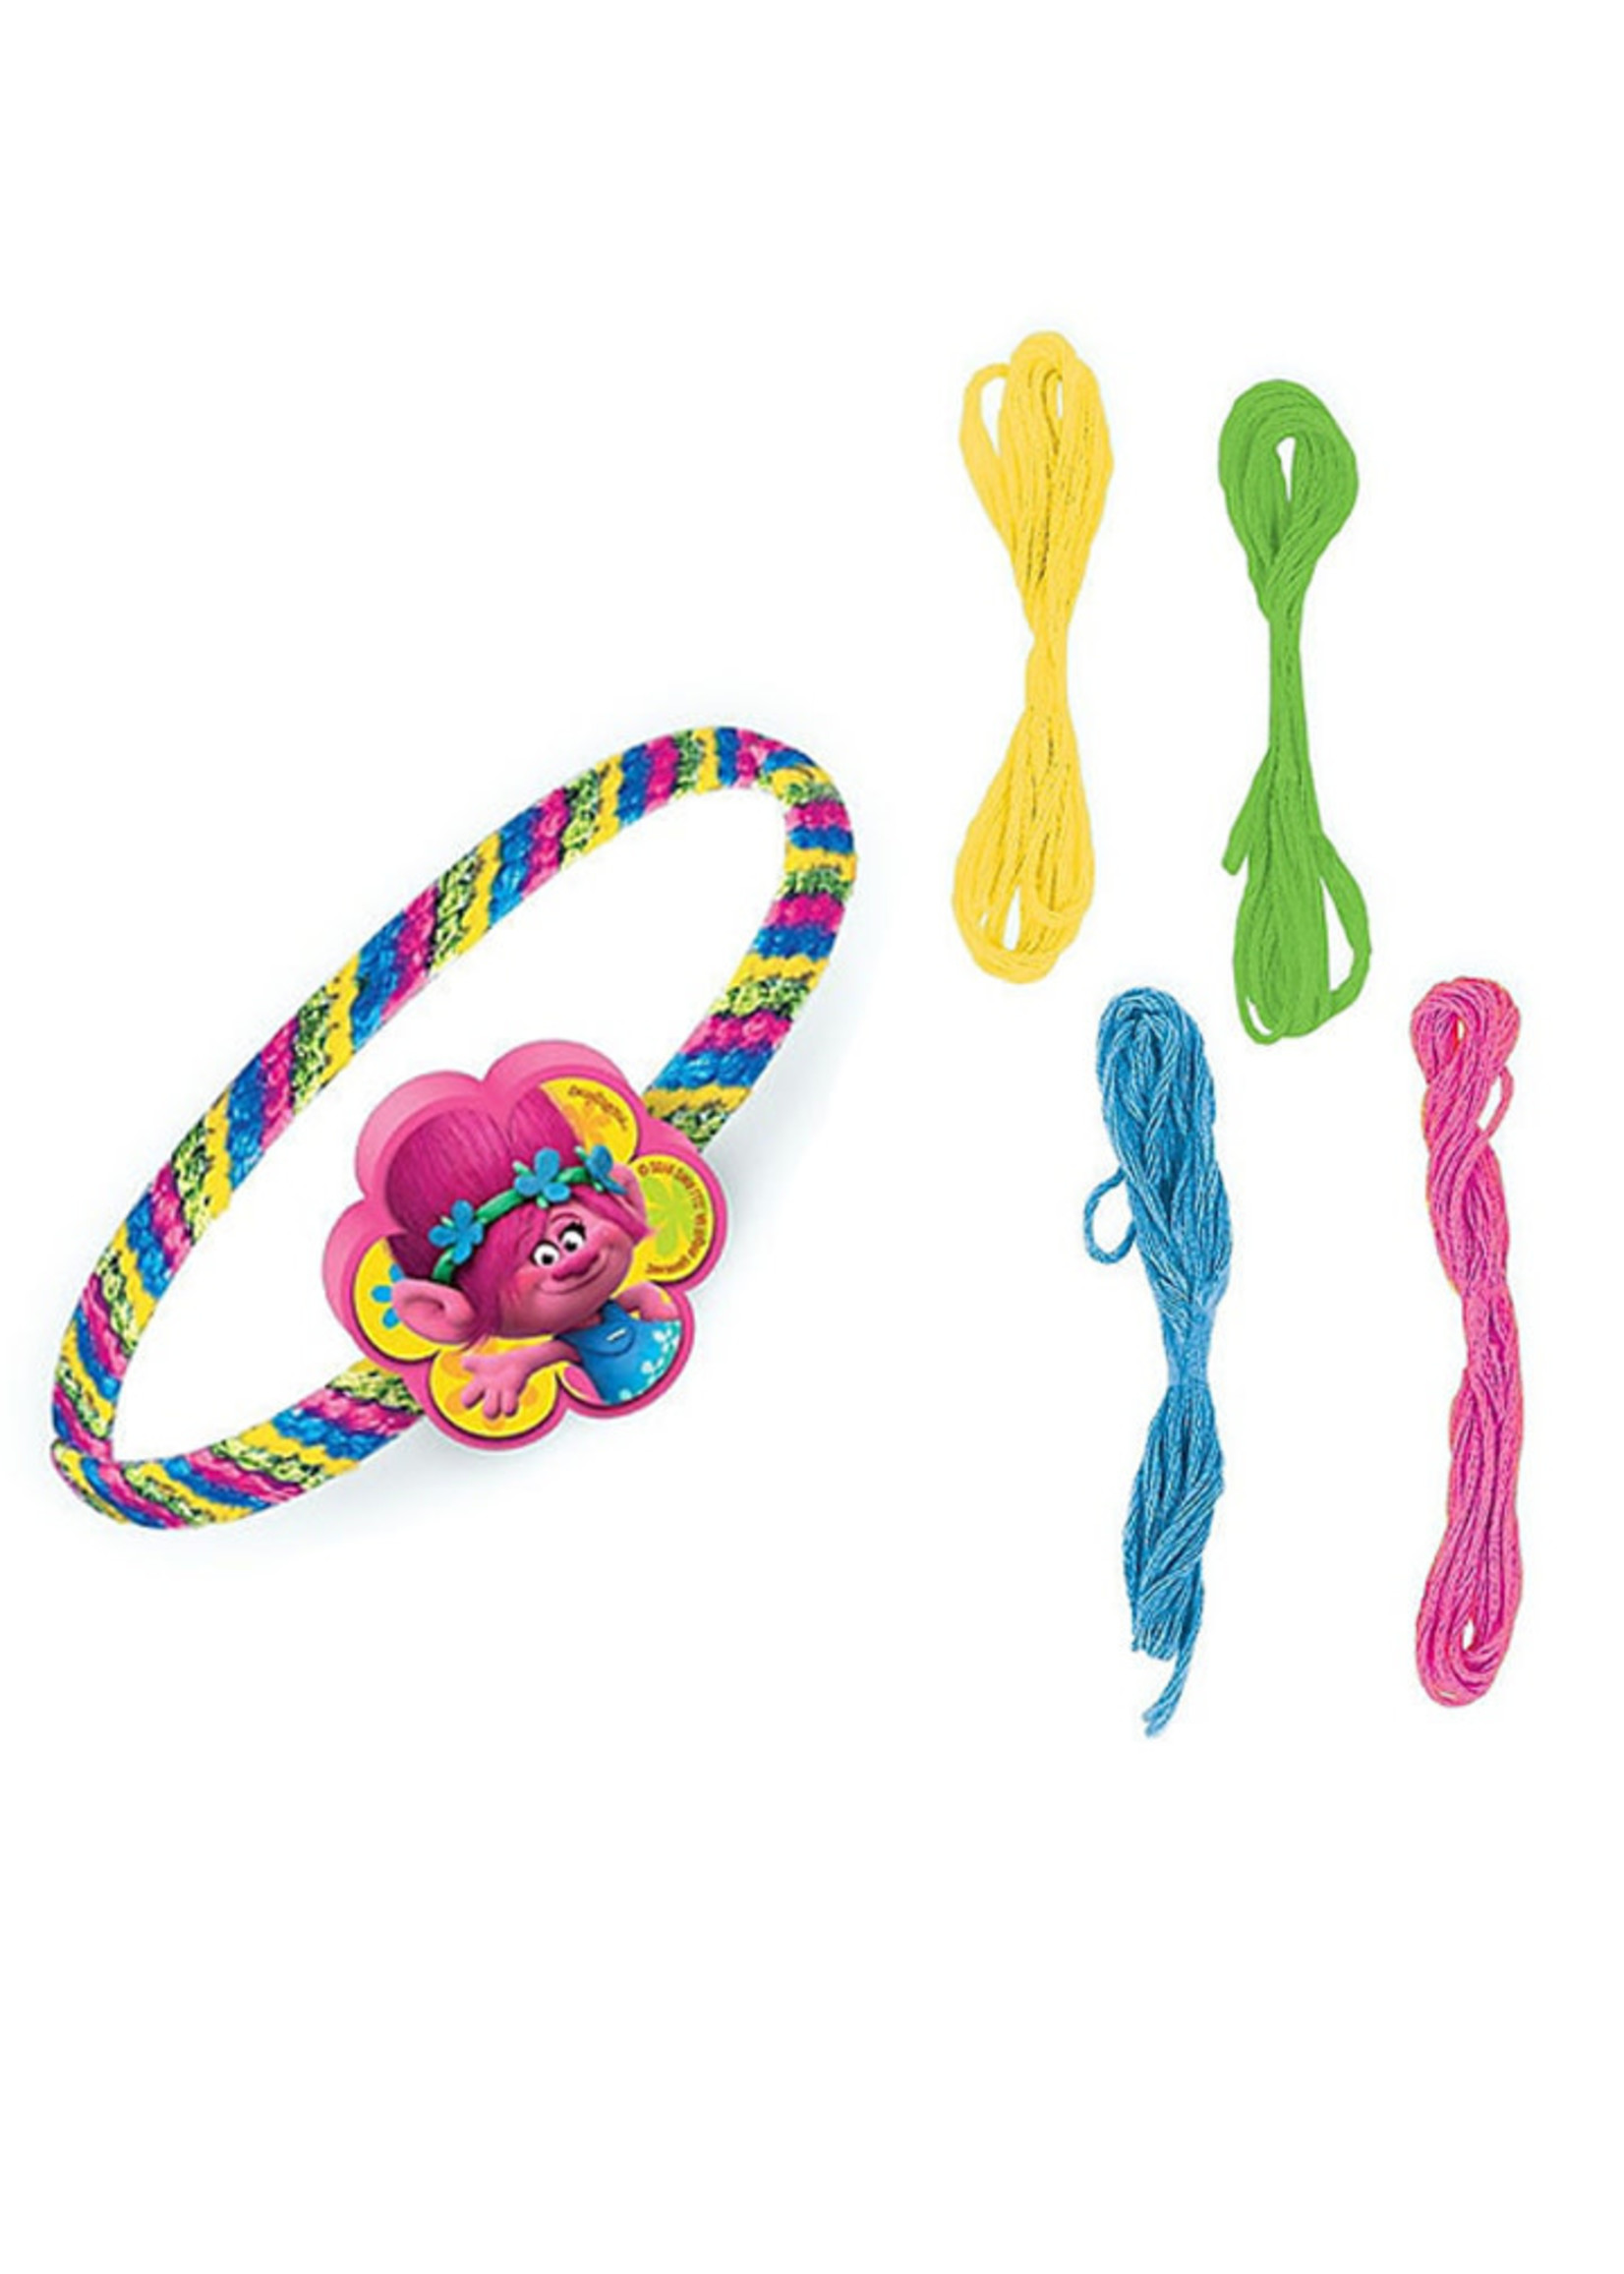 Trolls Friendship Bracelet Kits - 12ct